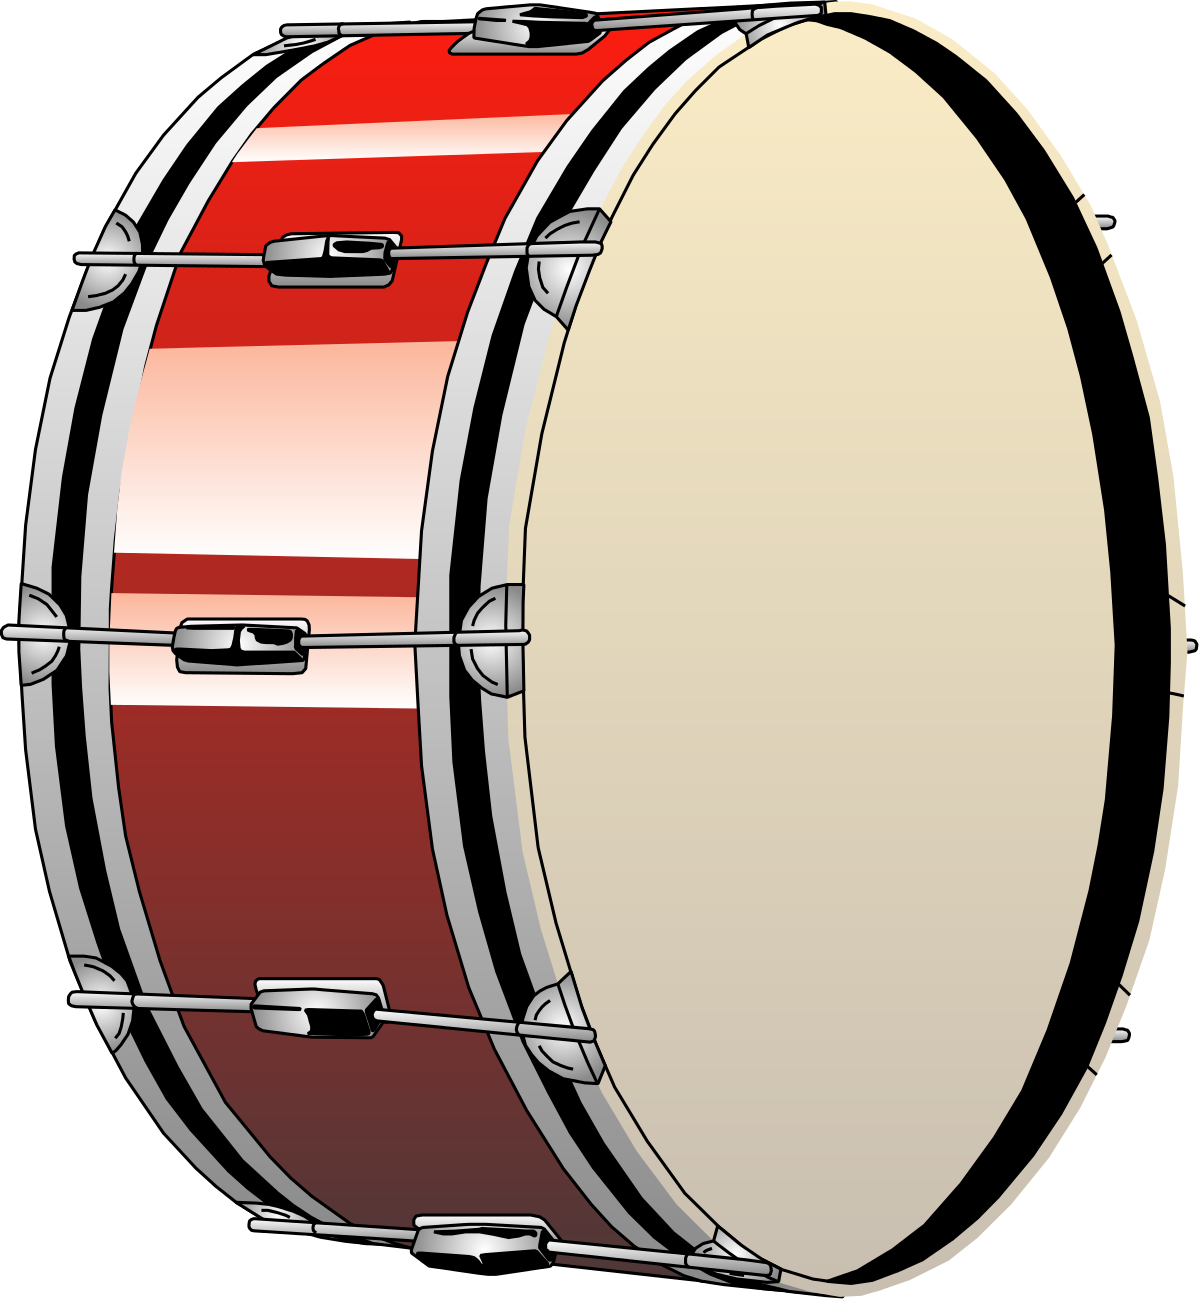 Drum clipart jazz drum. Bombo wikipedia la enciclopedia